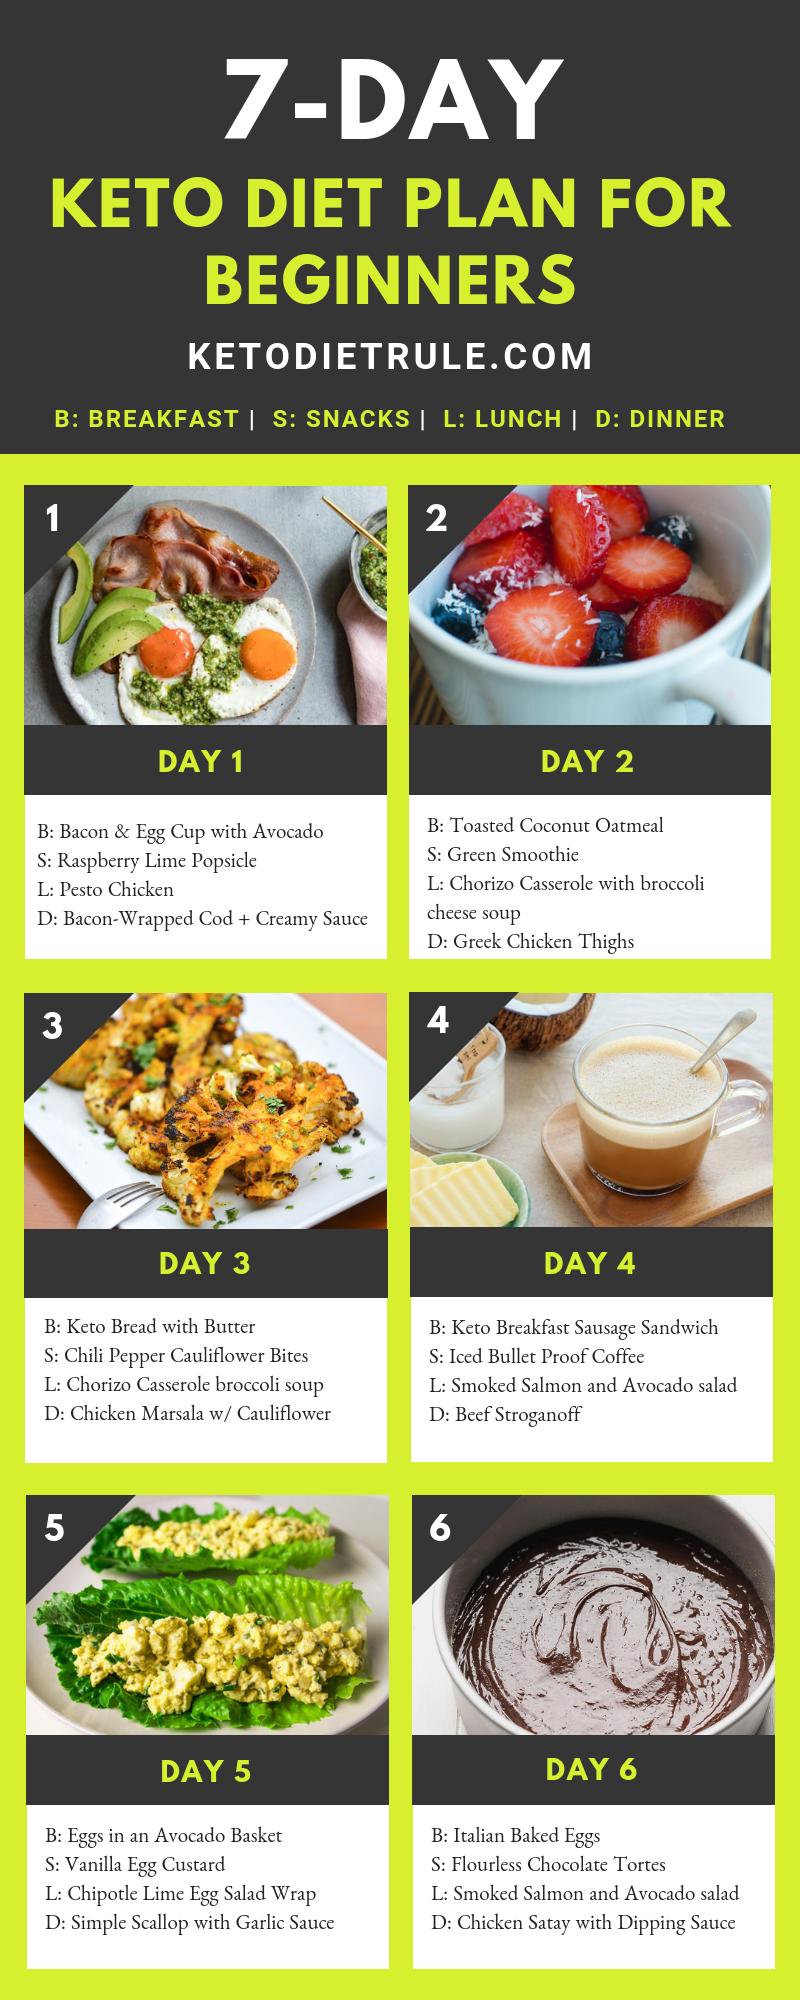 7 Day Keto Diet Plan To Transform Your Body Keto Diet Rule Keto Diet Menu Keto Diet Meal Plan Keto Diet Plan